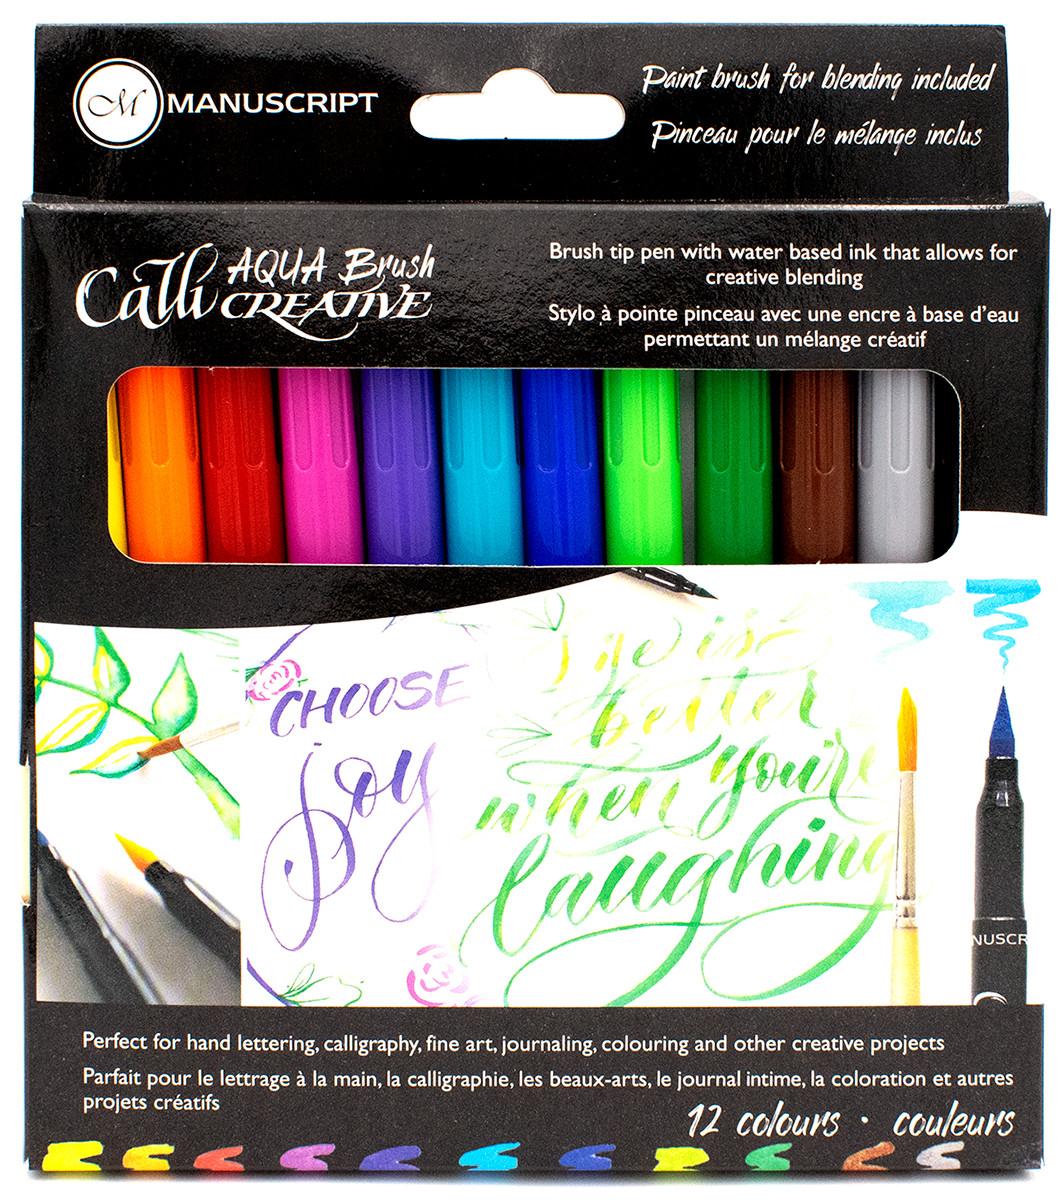 Manuscript Callicreative Aqua Brush Markers (Pack of 12)